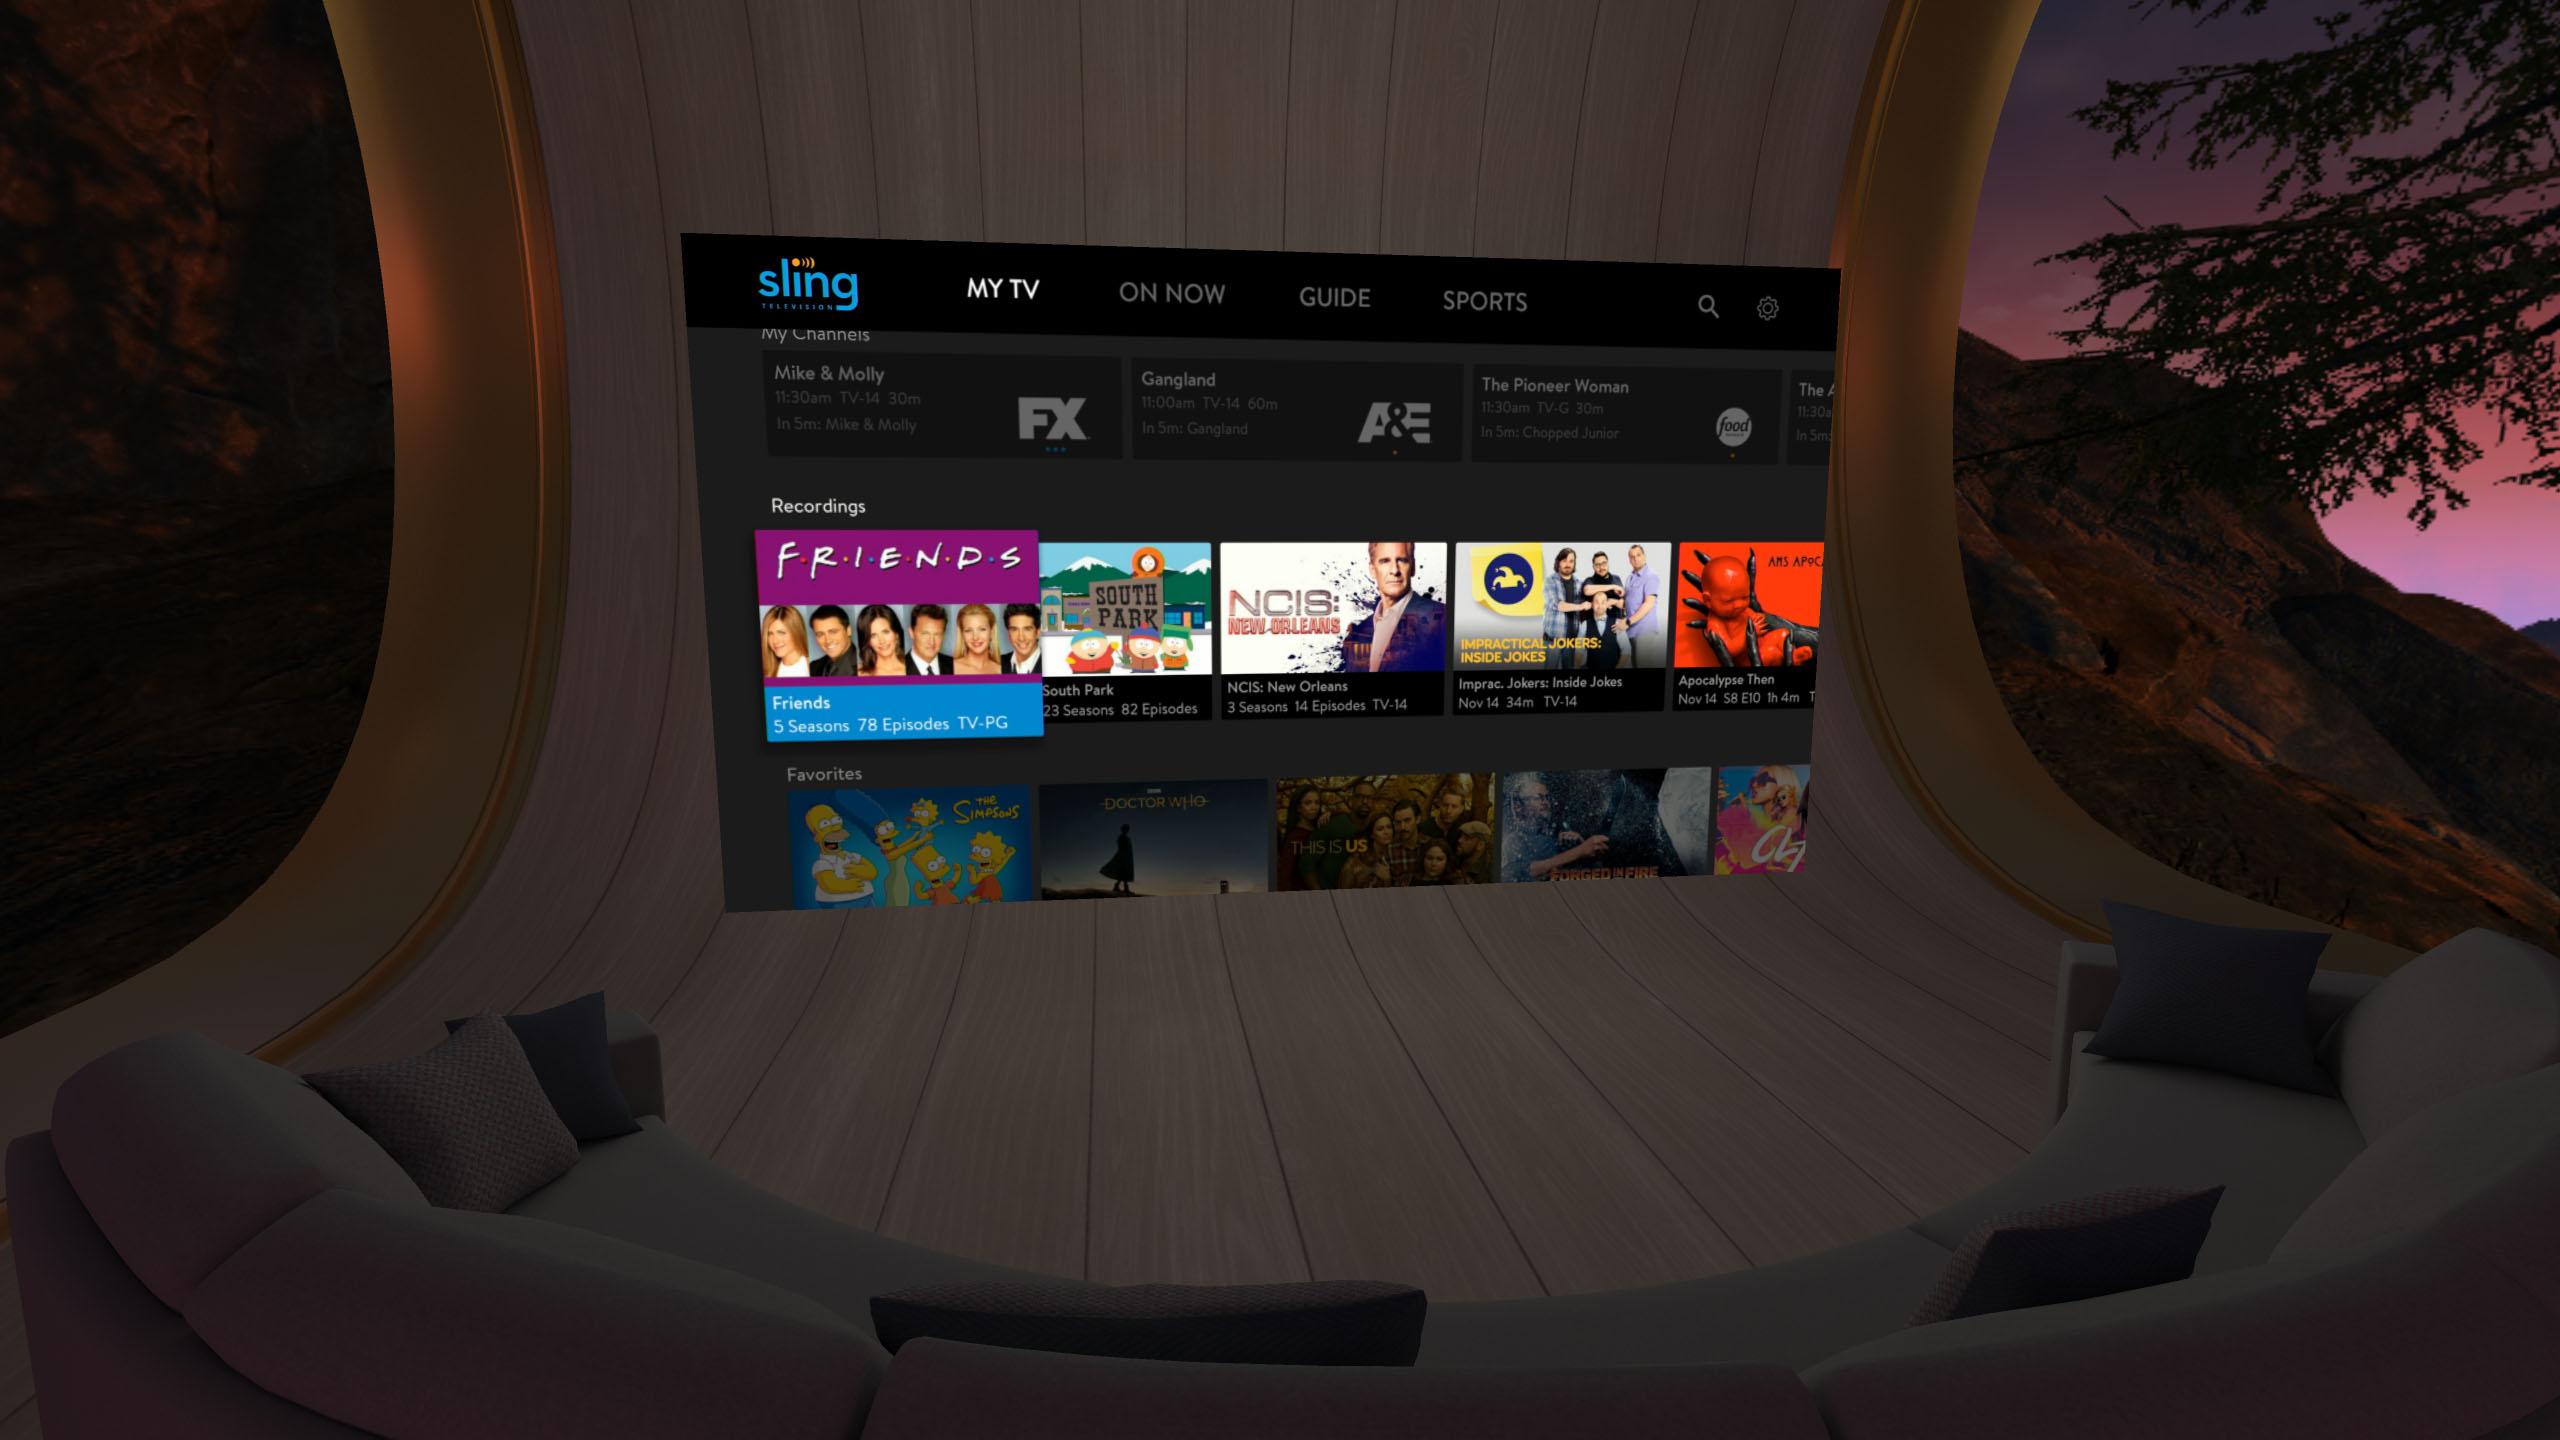 df5b44059ed3 Sling TV brings first vMVPD to Oculus Go virtual reality headset ...